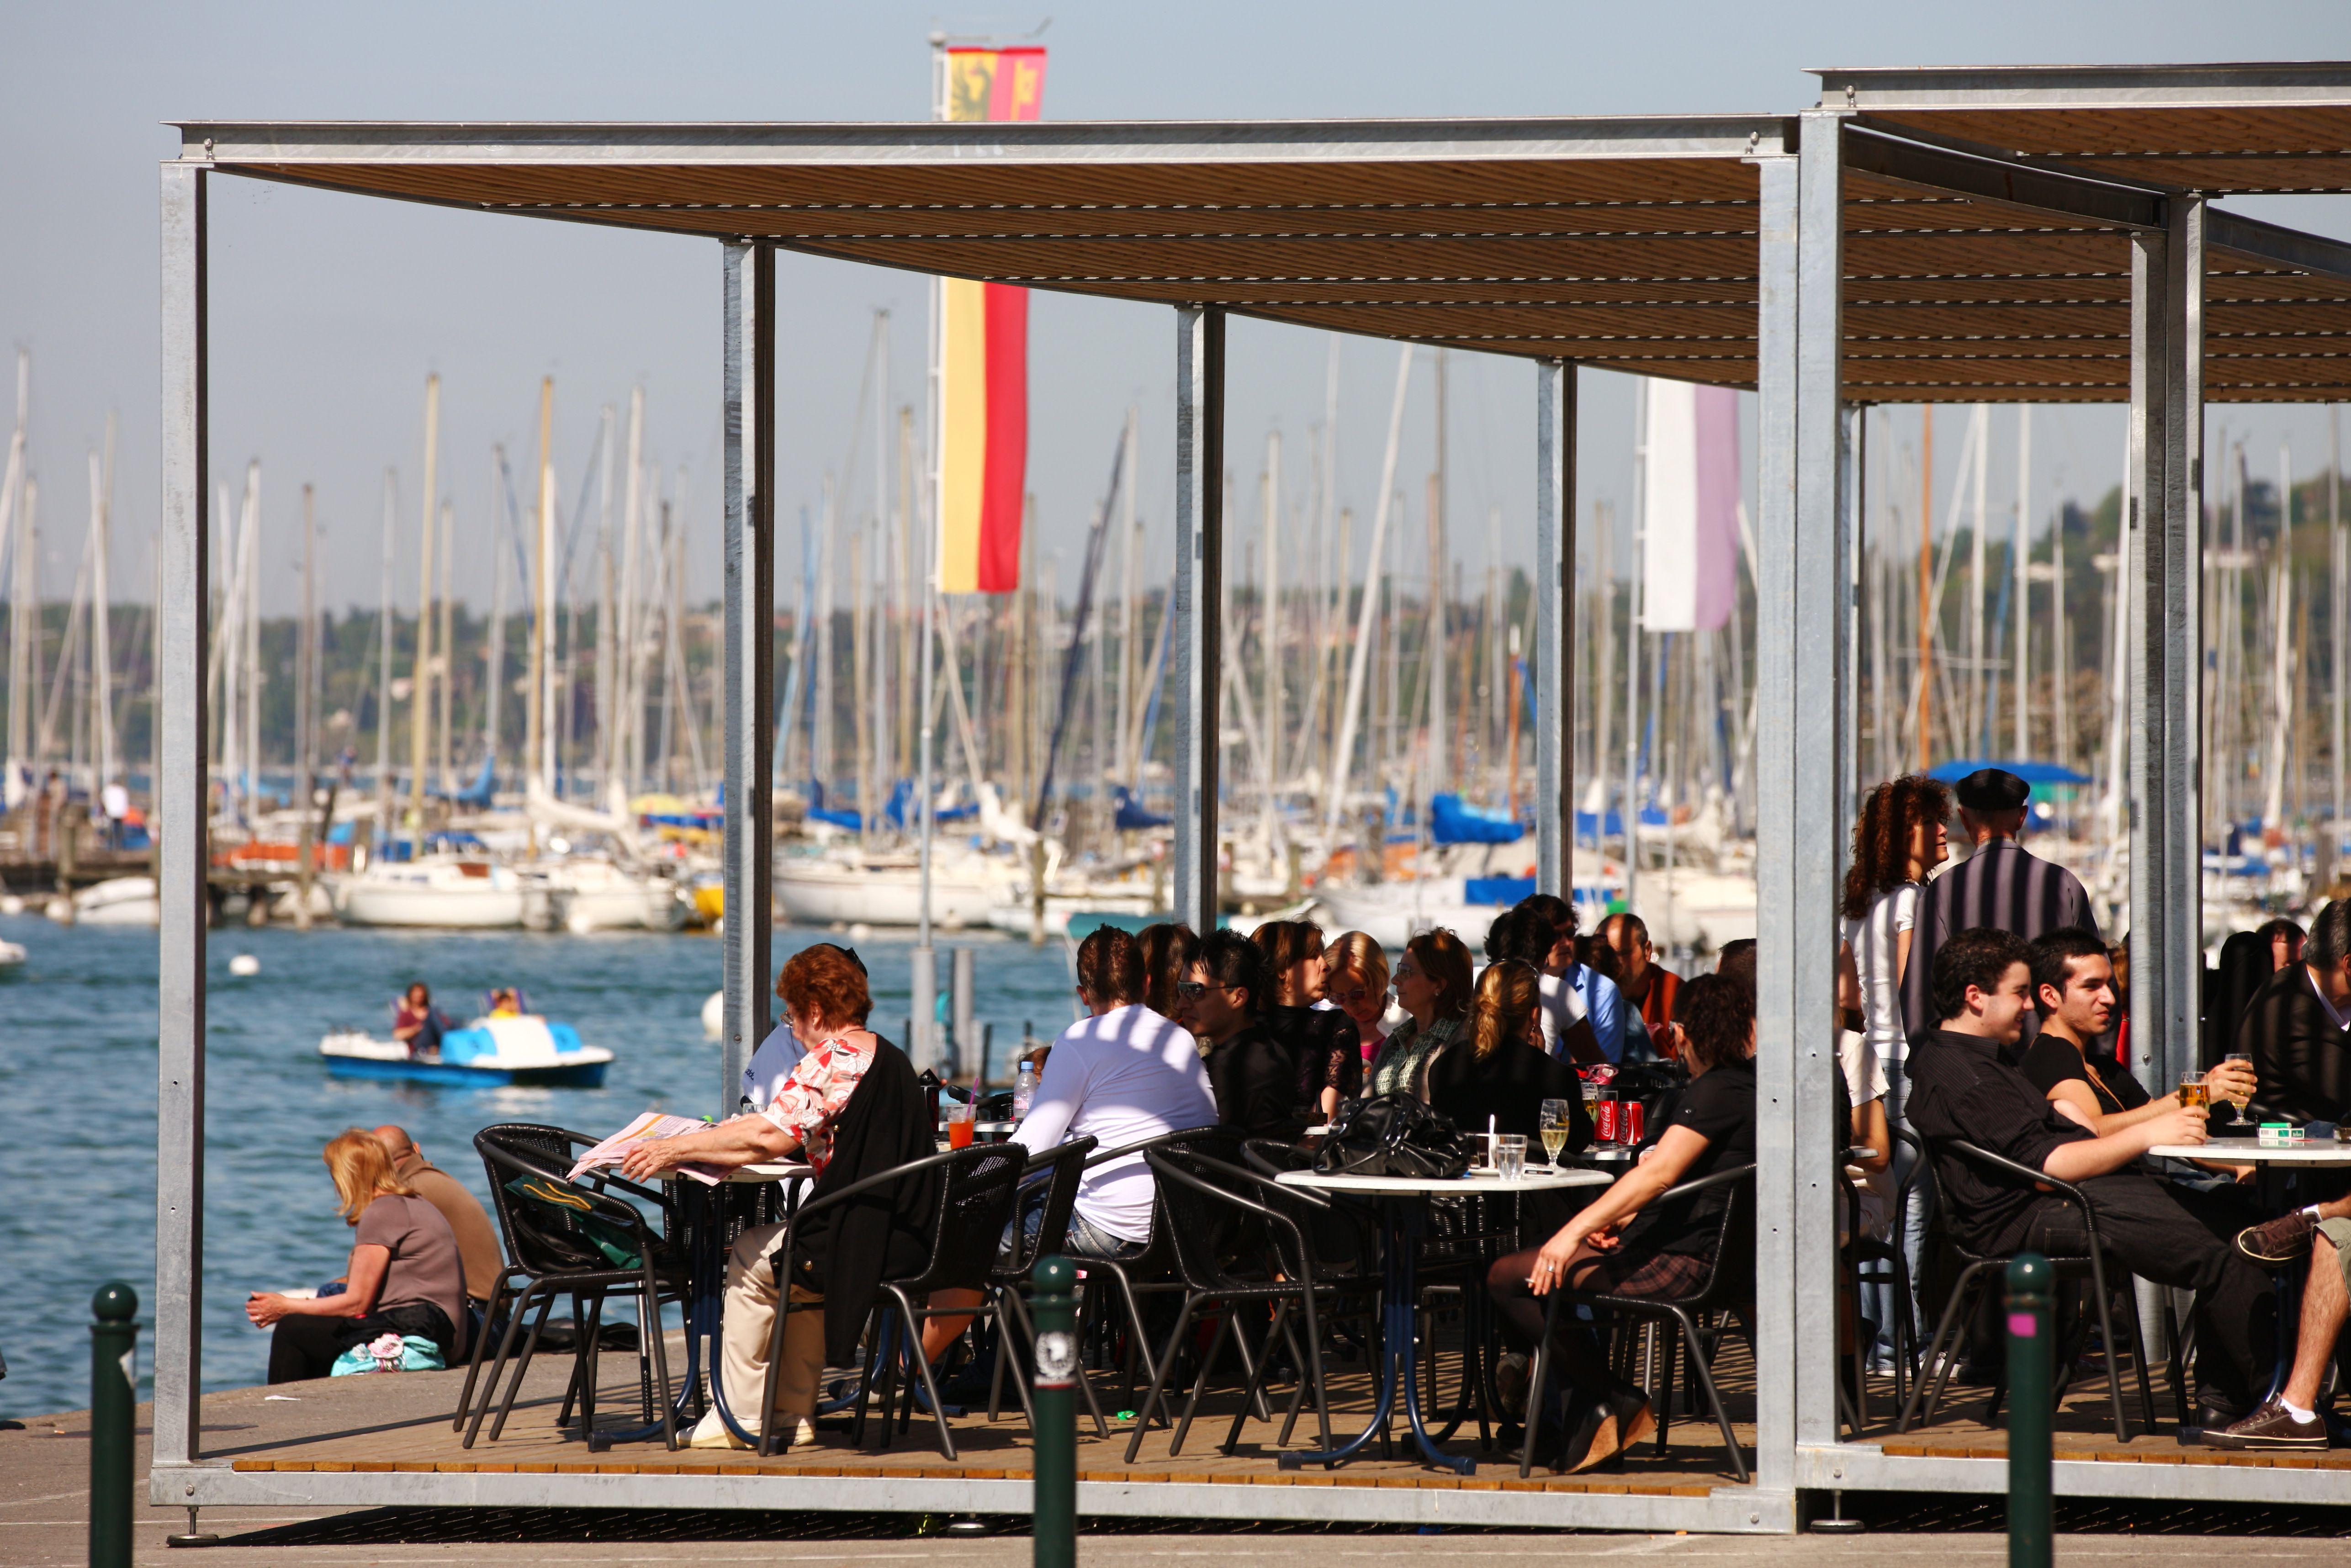 Patrons along the waterfront enjoying Wi-Fi in Geneva